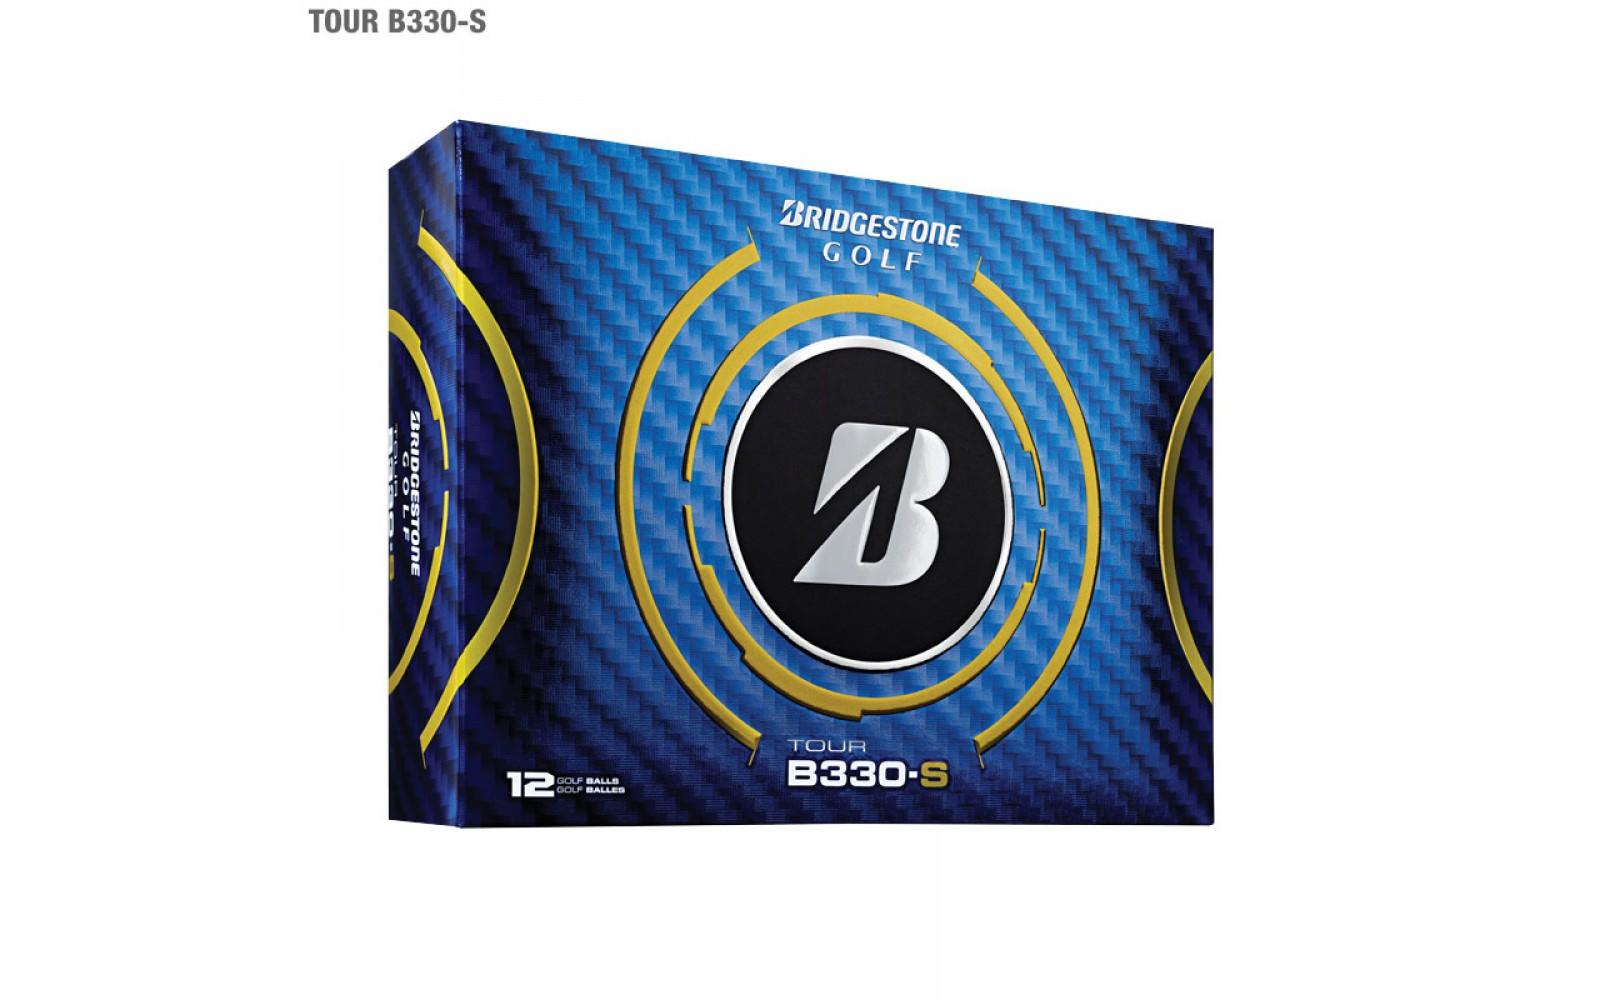 Bridgestone Tour B330-S Golfballen